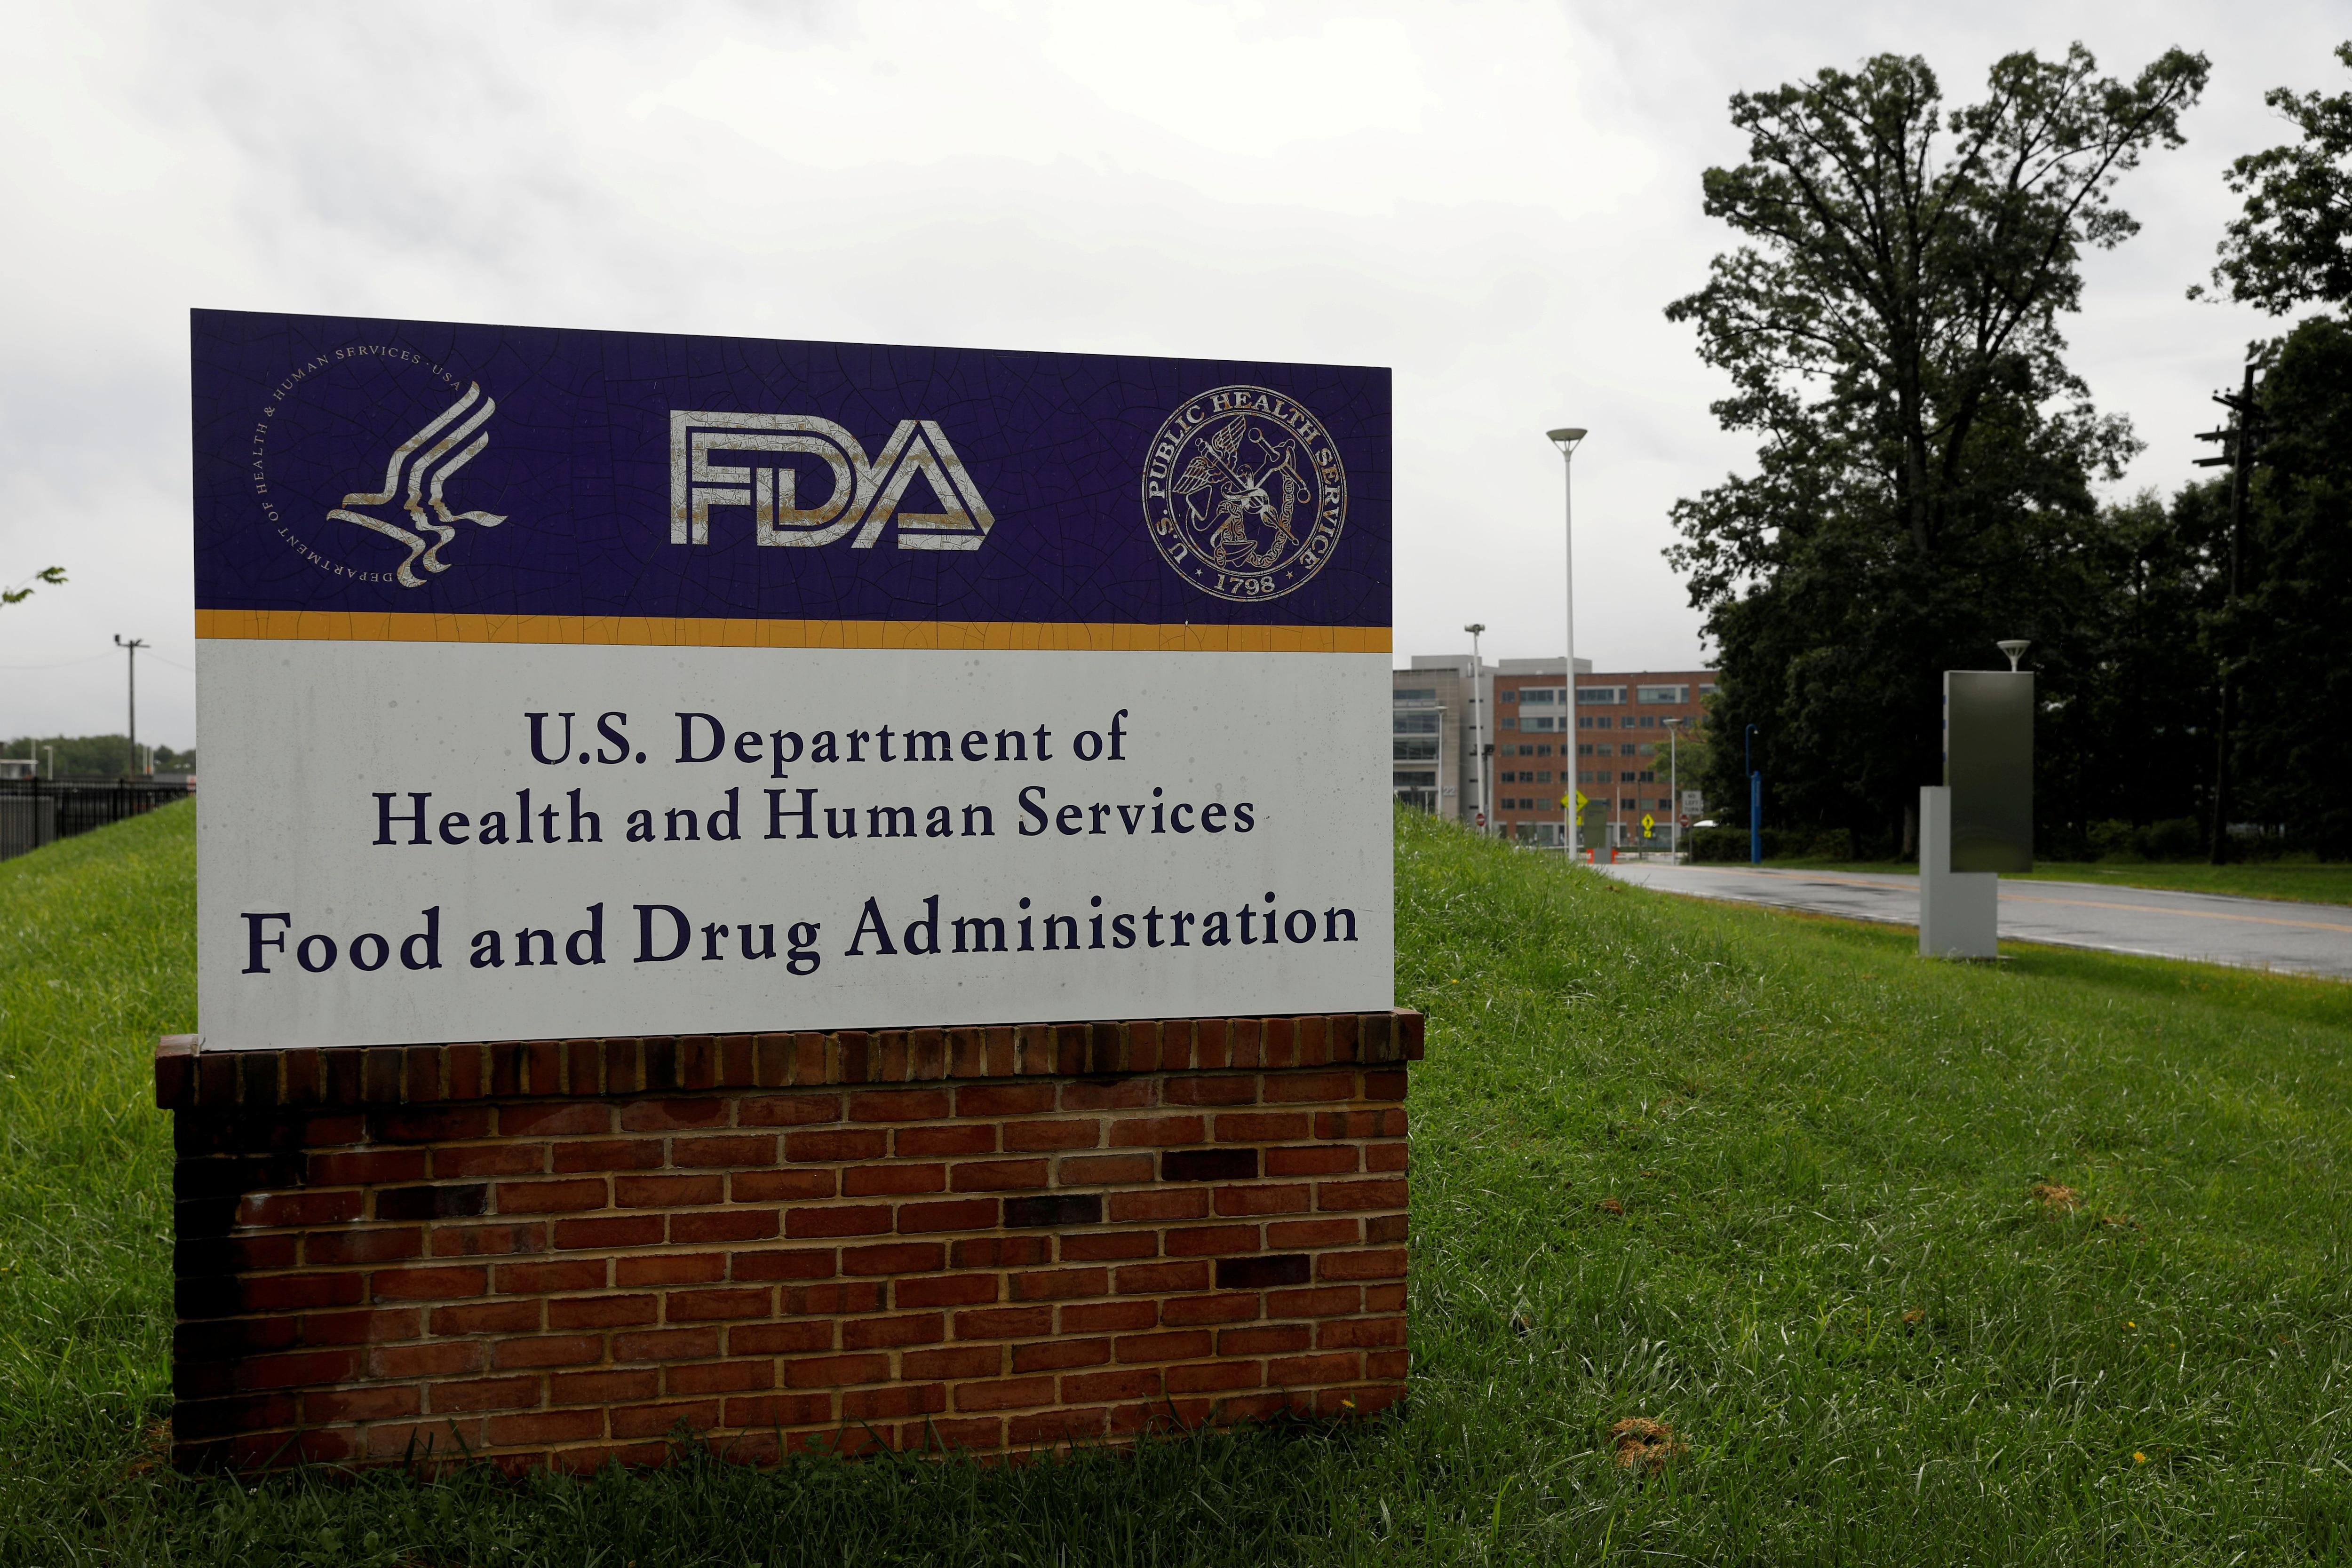 La FDA se pronunció junto a los CDC de forma inmediata REUTERS/Andrew Kelly/File Photo